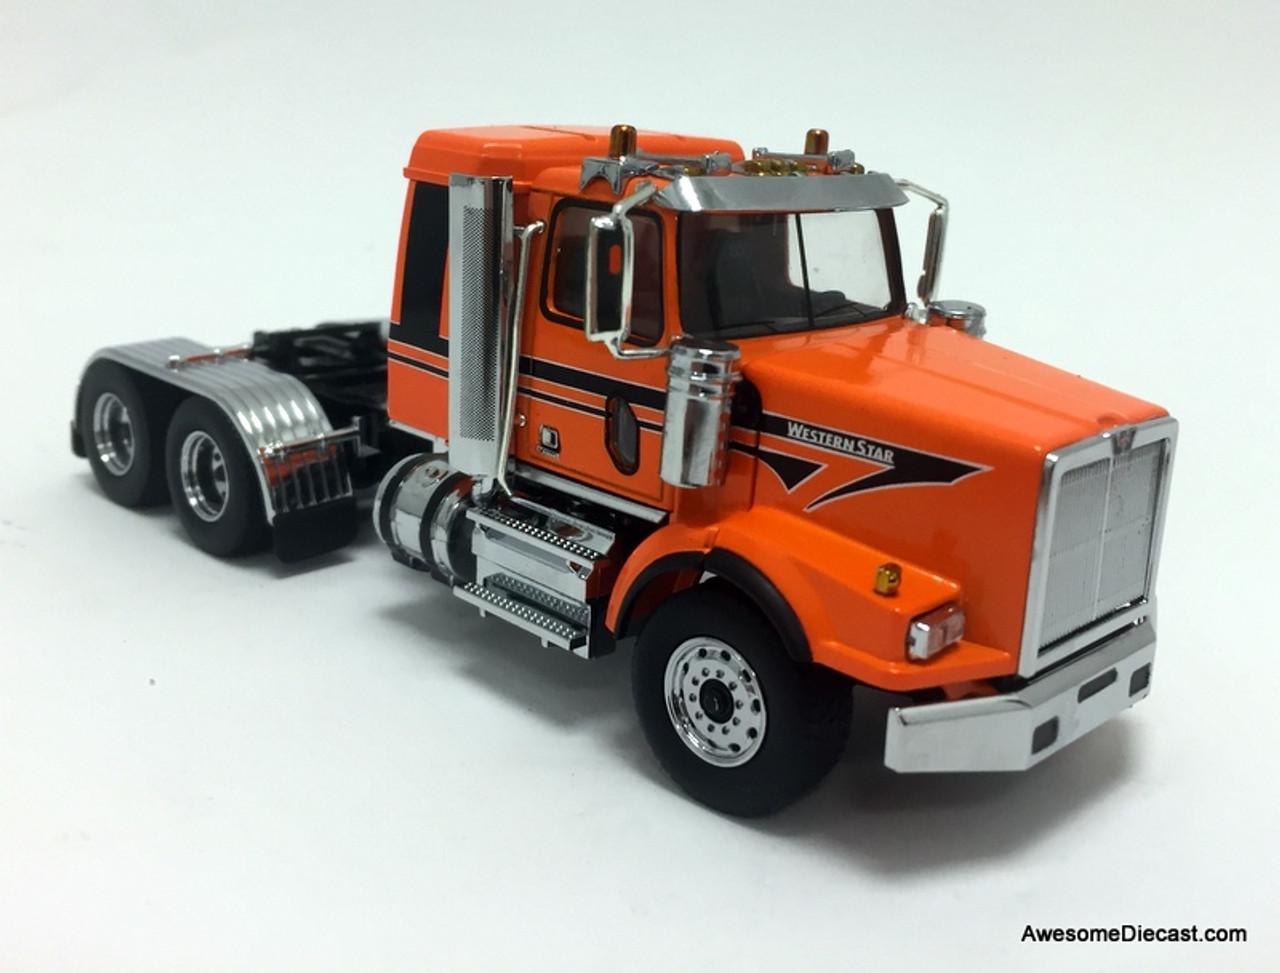 Metallic-orange cab ... Western Star 1:50 scale 4900 SB Sleeper Tandem Tractor